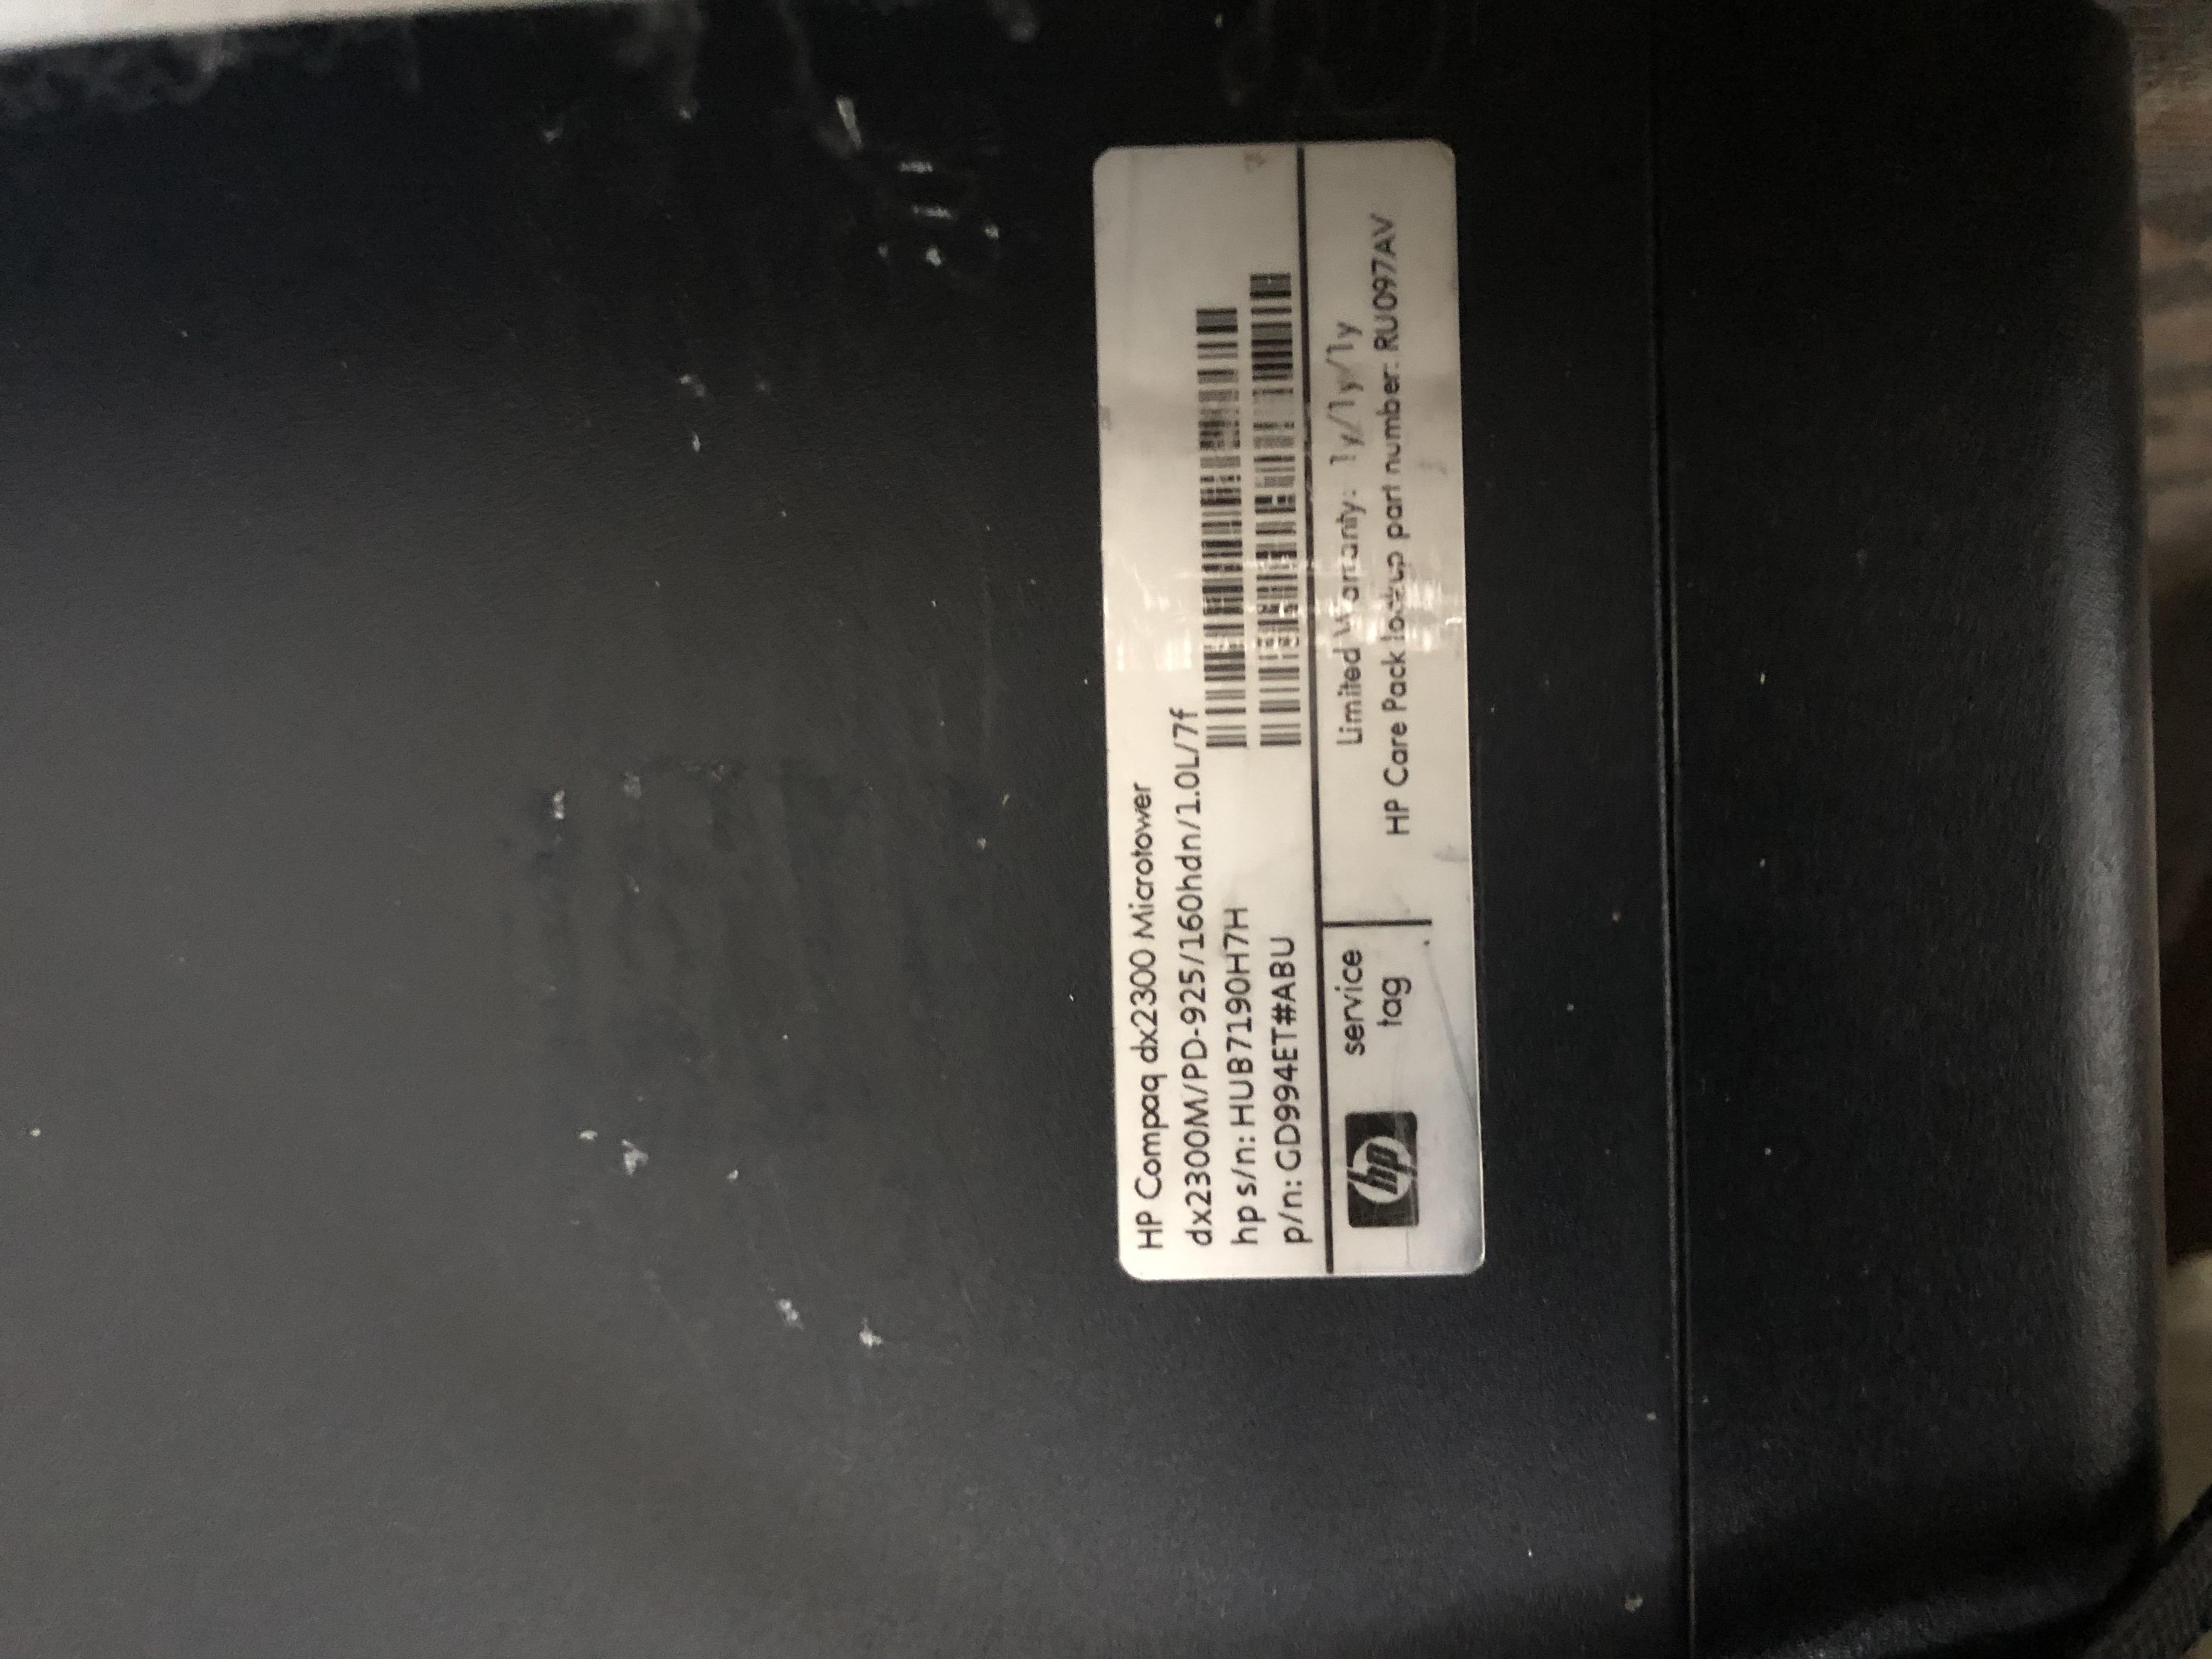 HP Compaq DX2300 Microtower, Black, Windows 10 Home. Intel Dual Core Processor